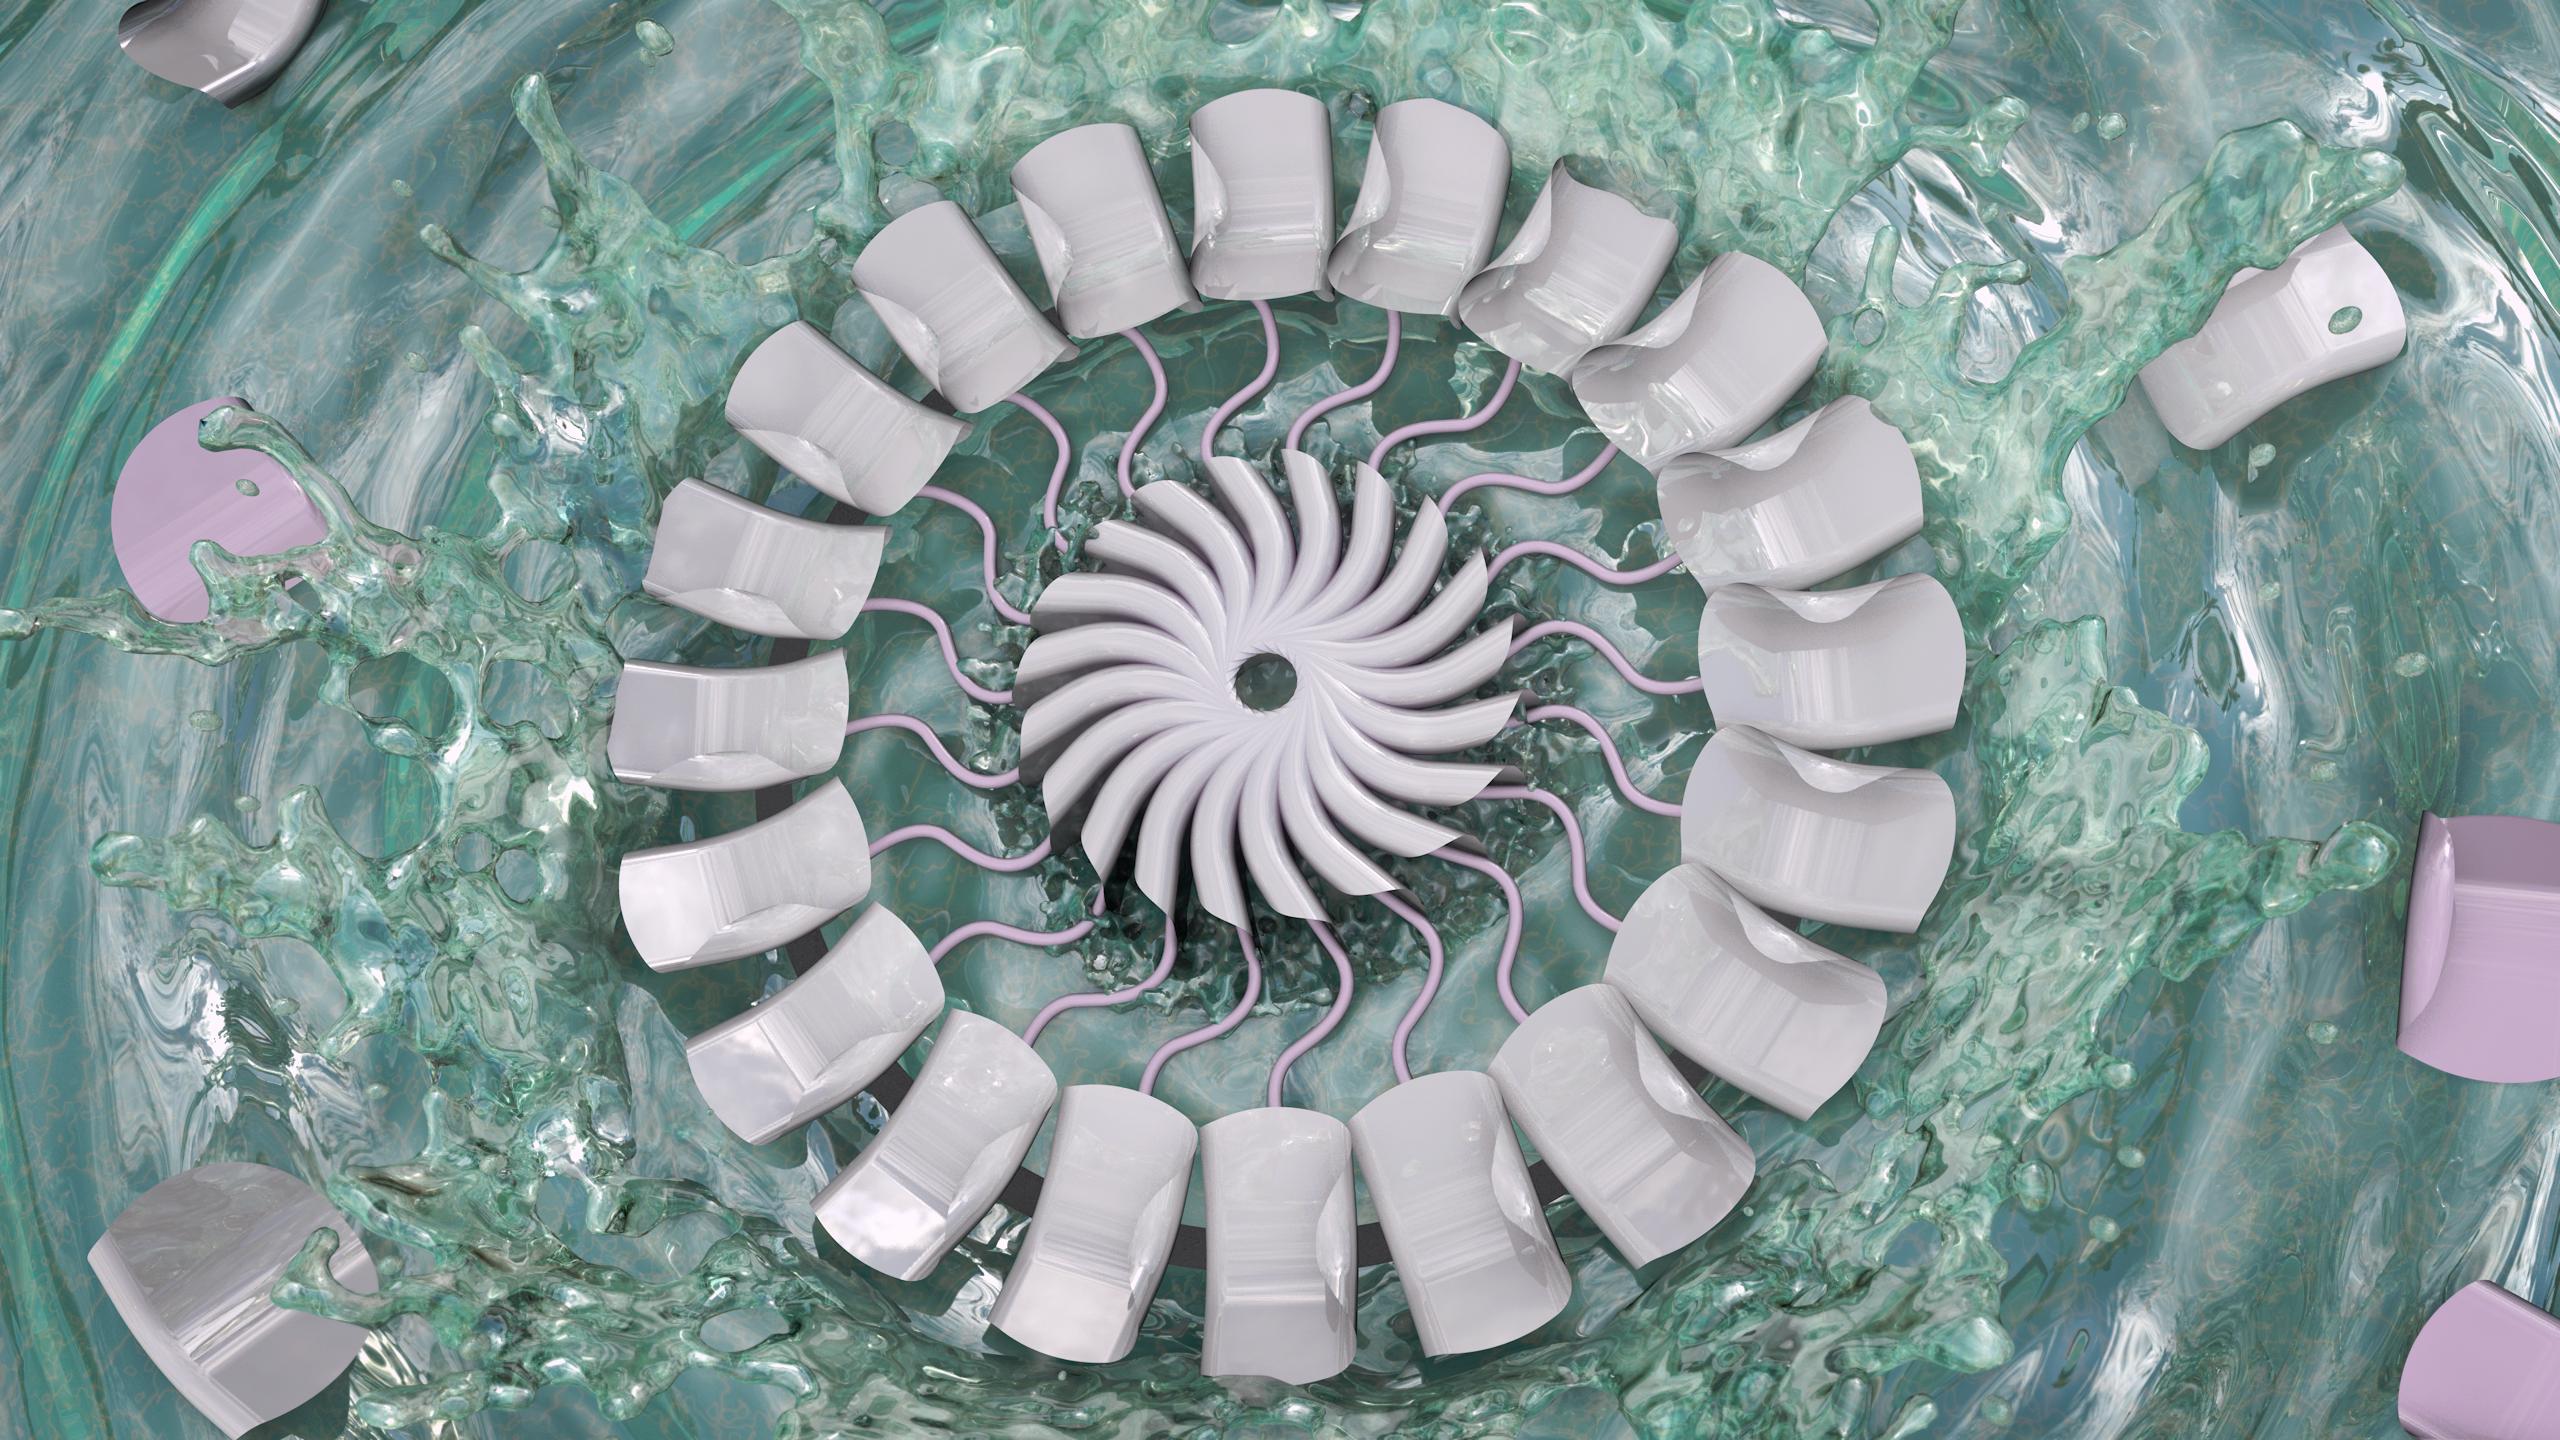 General 2560x1440 abstract 3D Abstract water splash splashes Twist fractal liquid water water drops